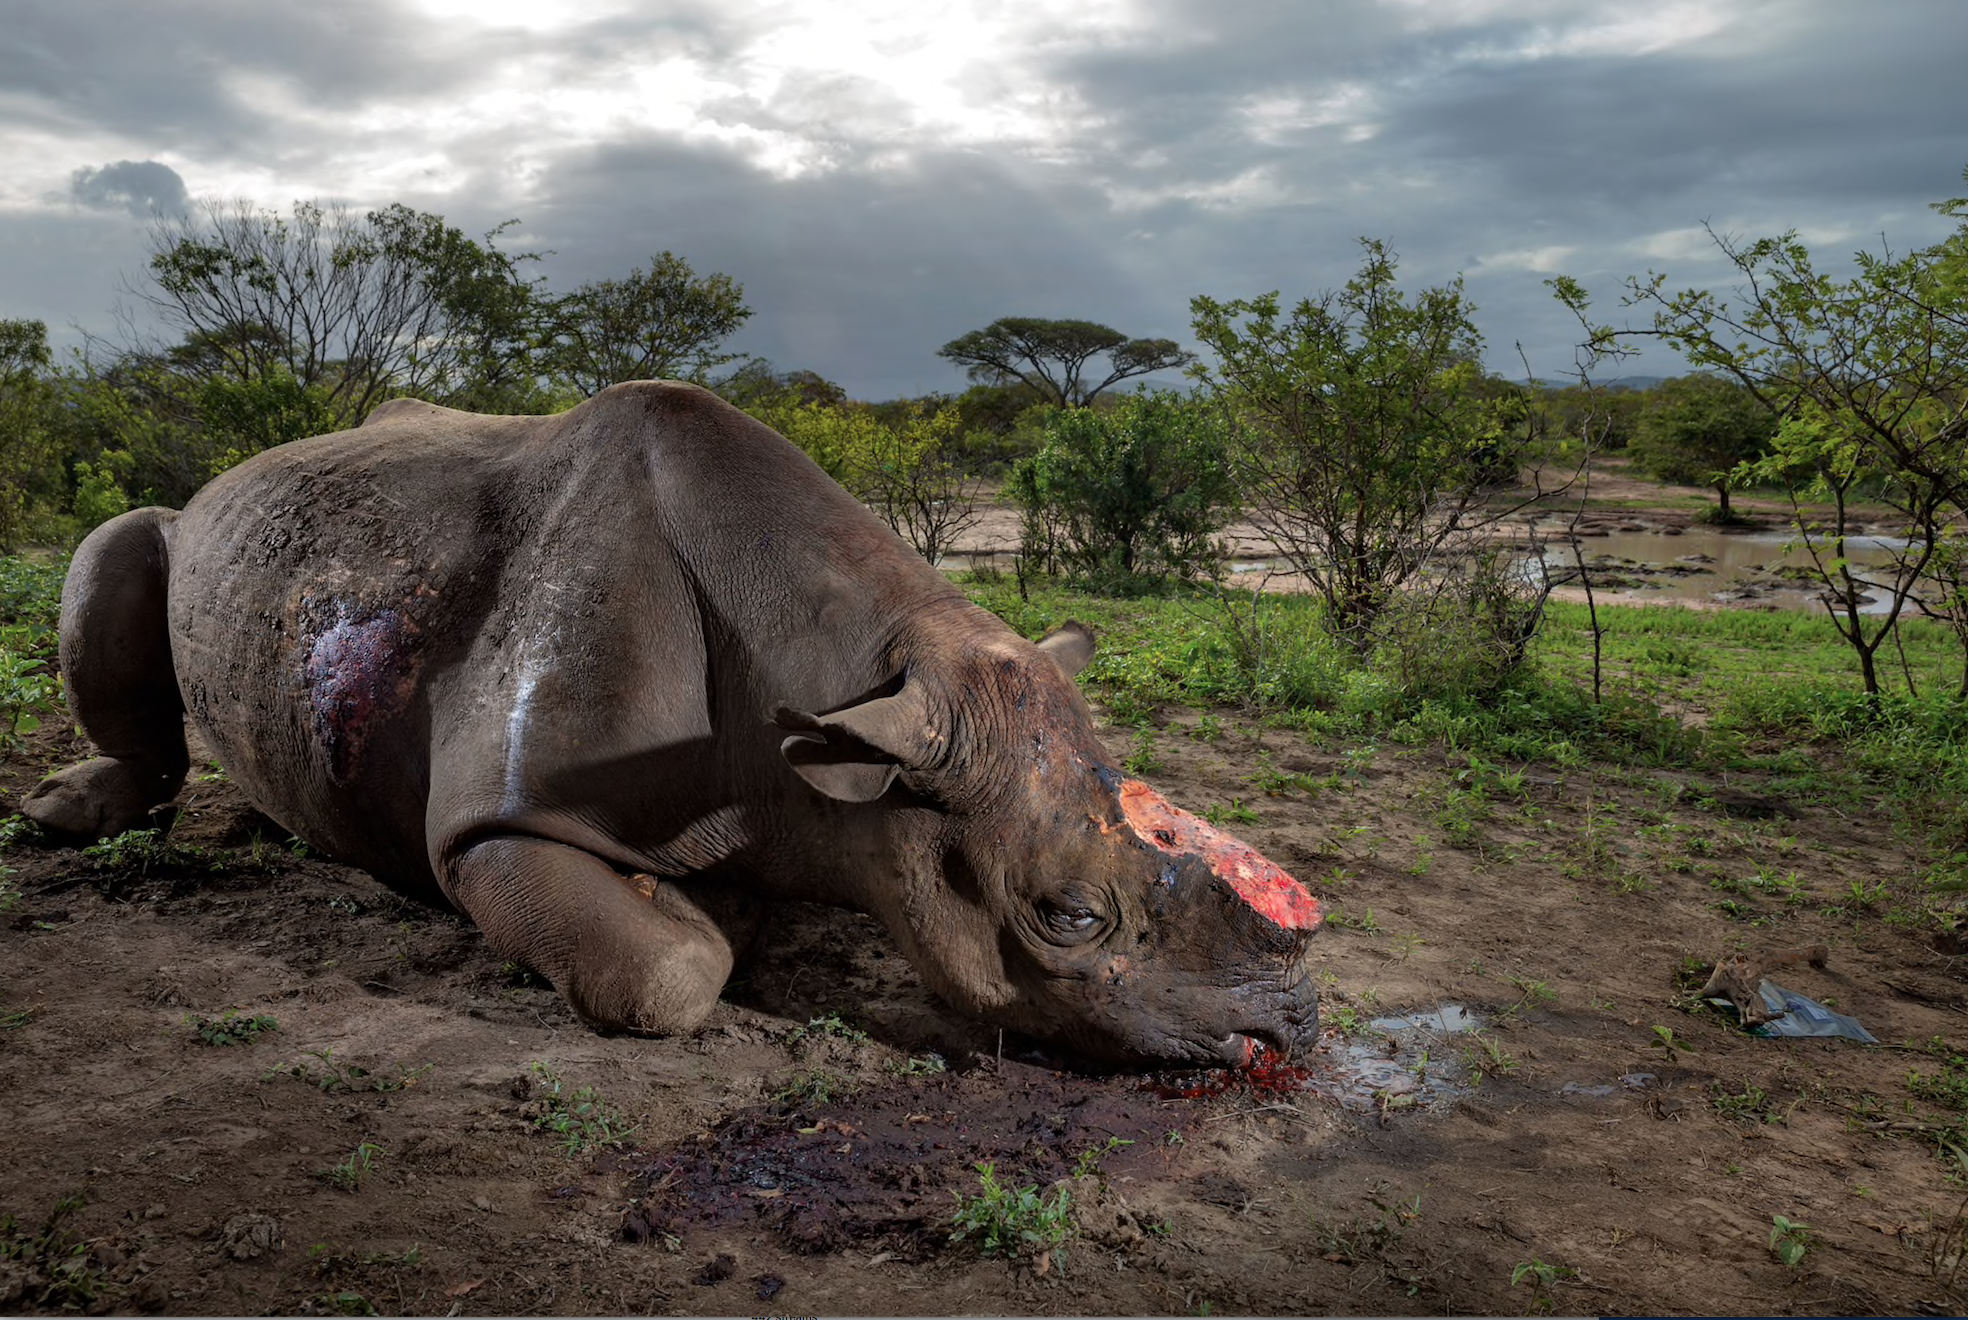 ©Brent Stireton/National Geographic